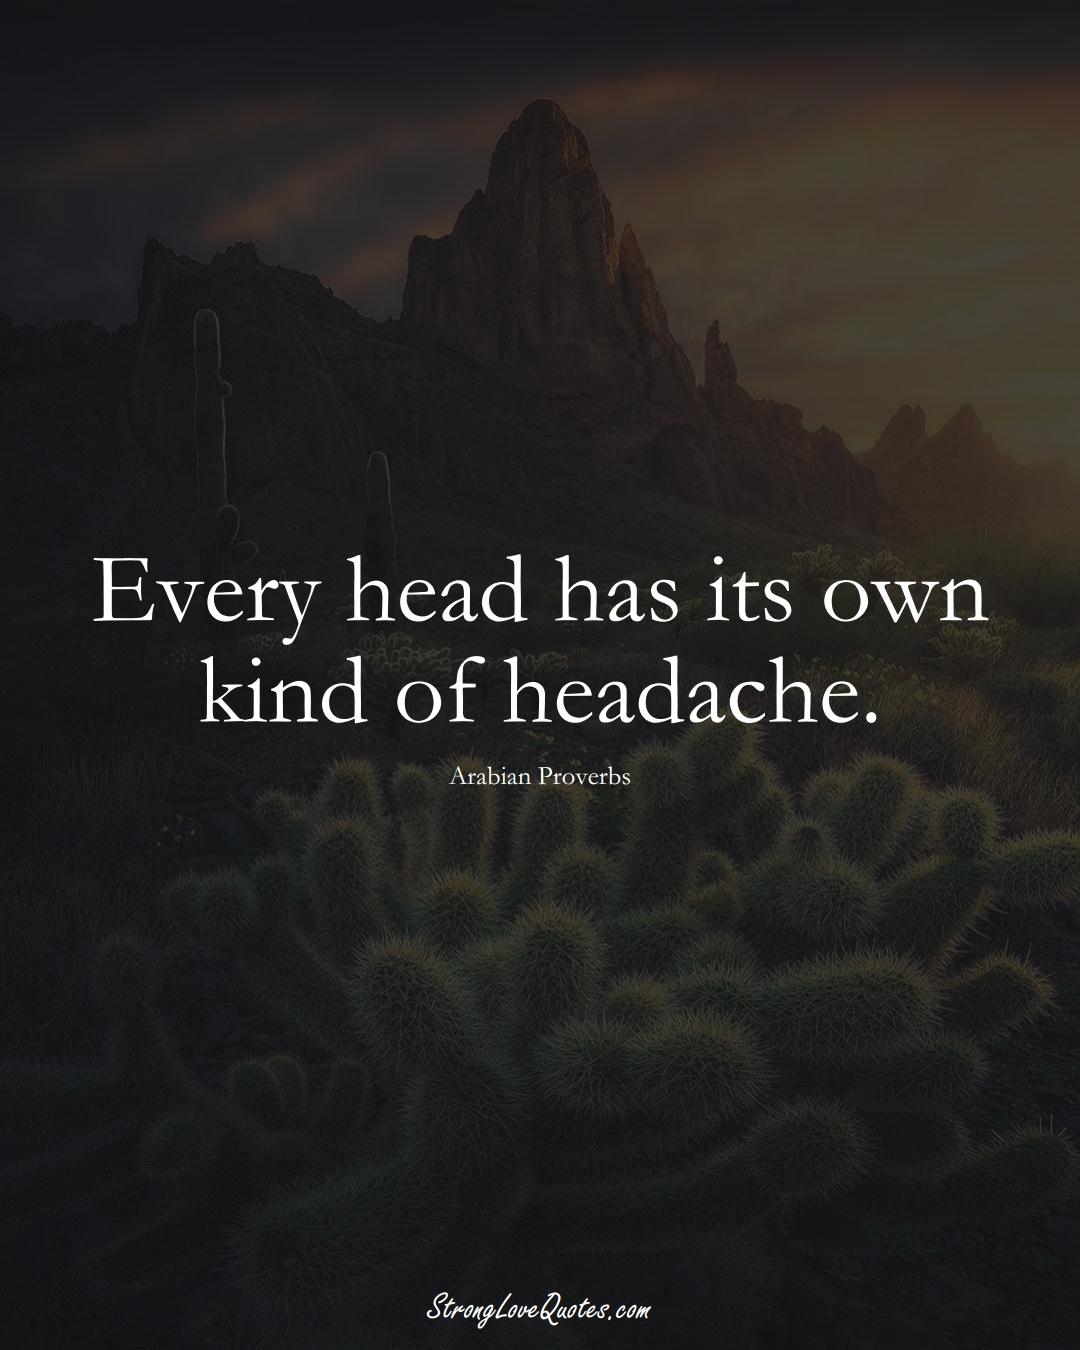 Every head has its own kind of headache. (Arabian Sayings);  #aVarietyofCulturesSayings